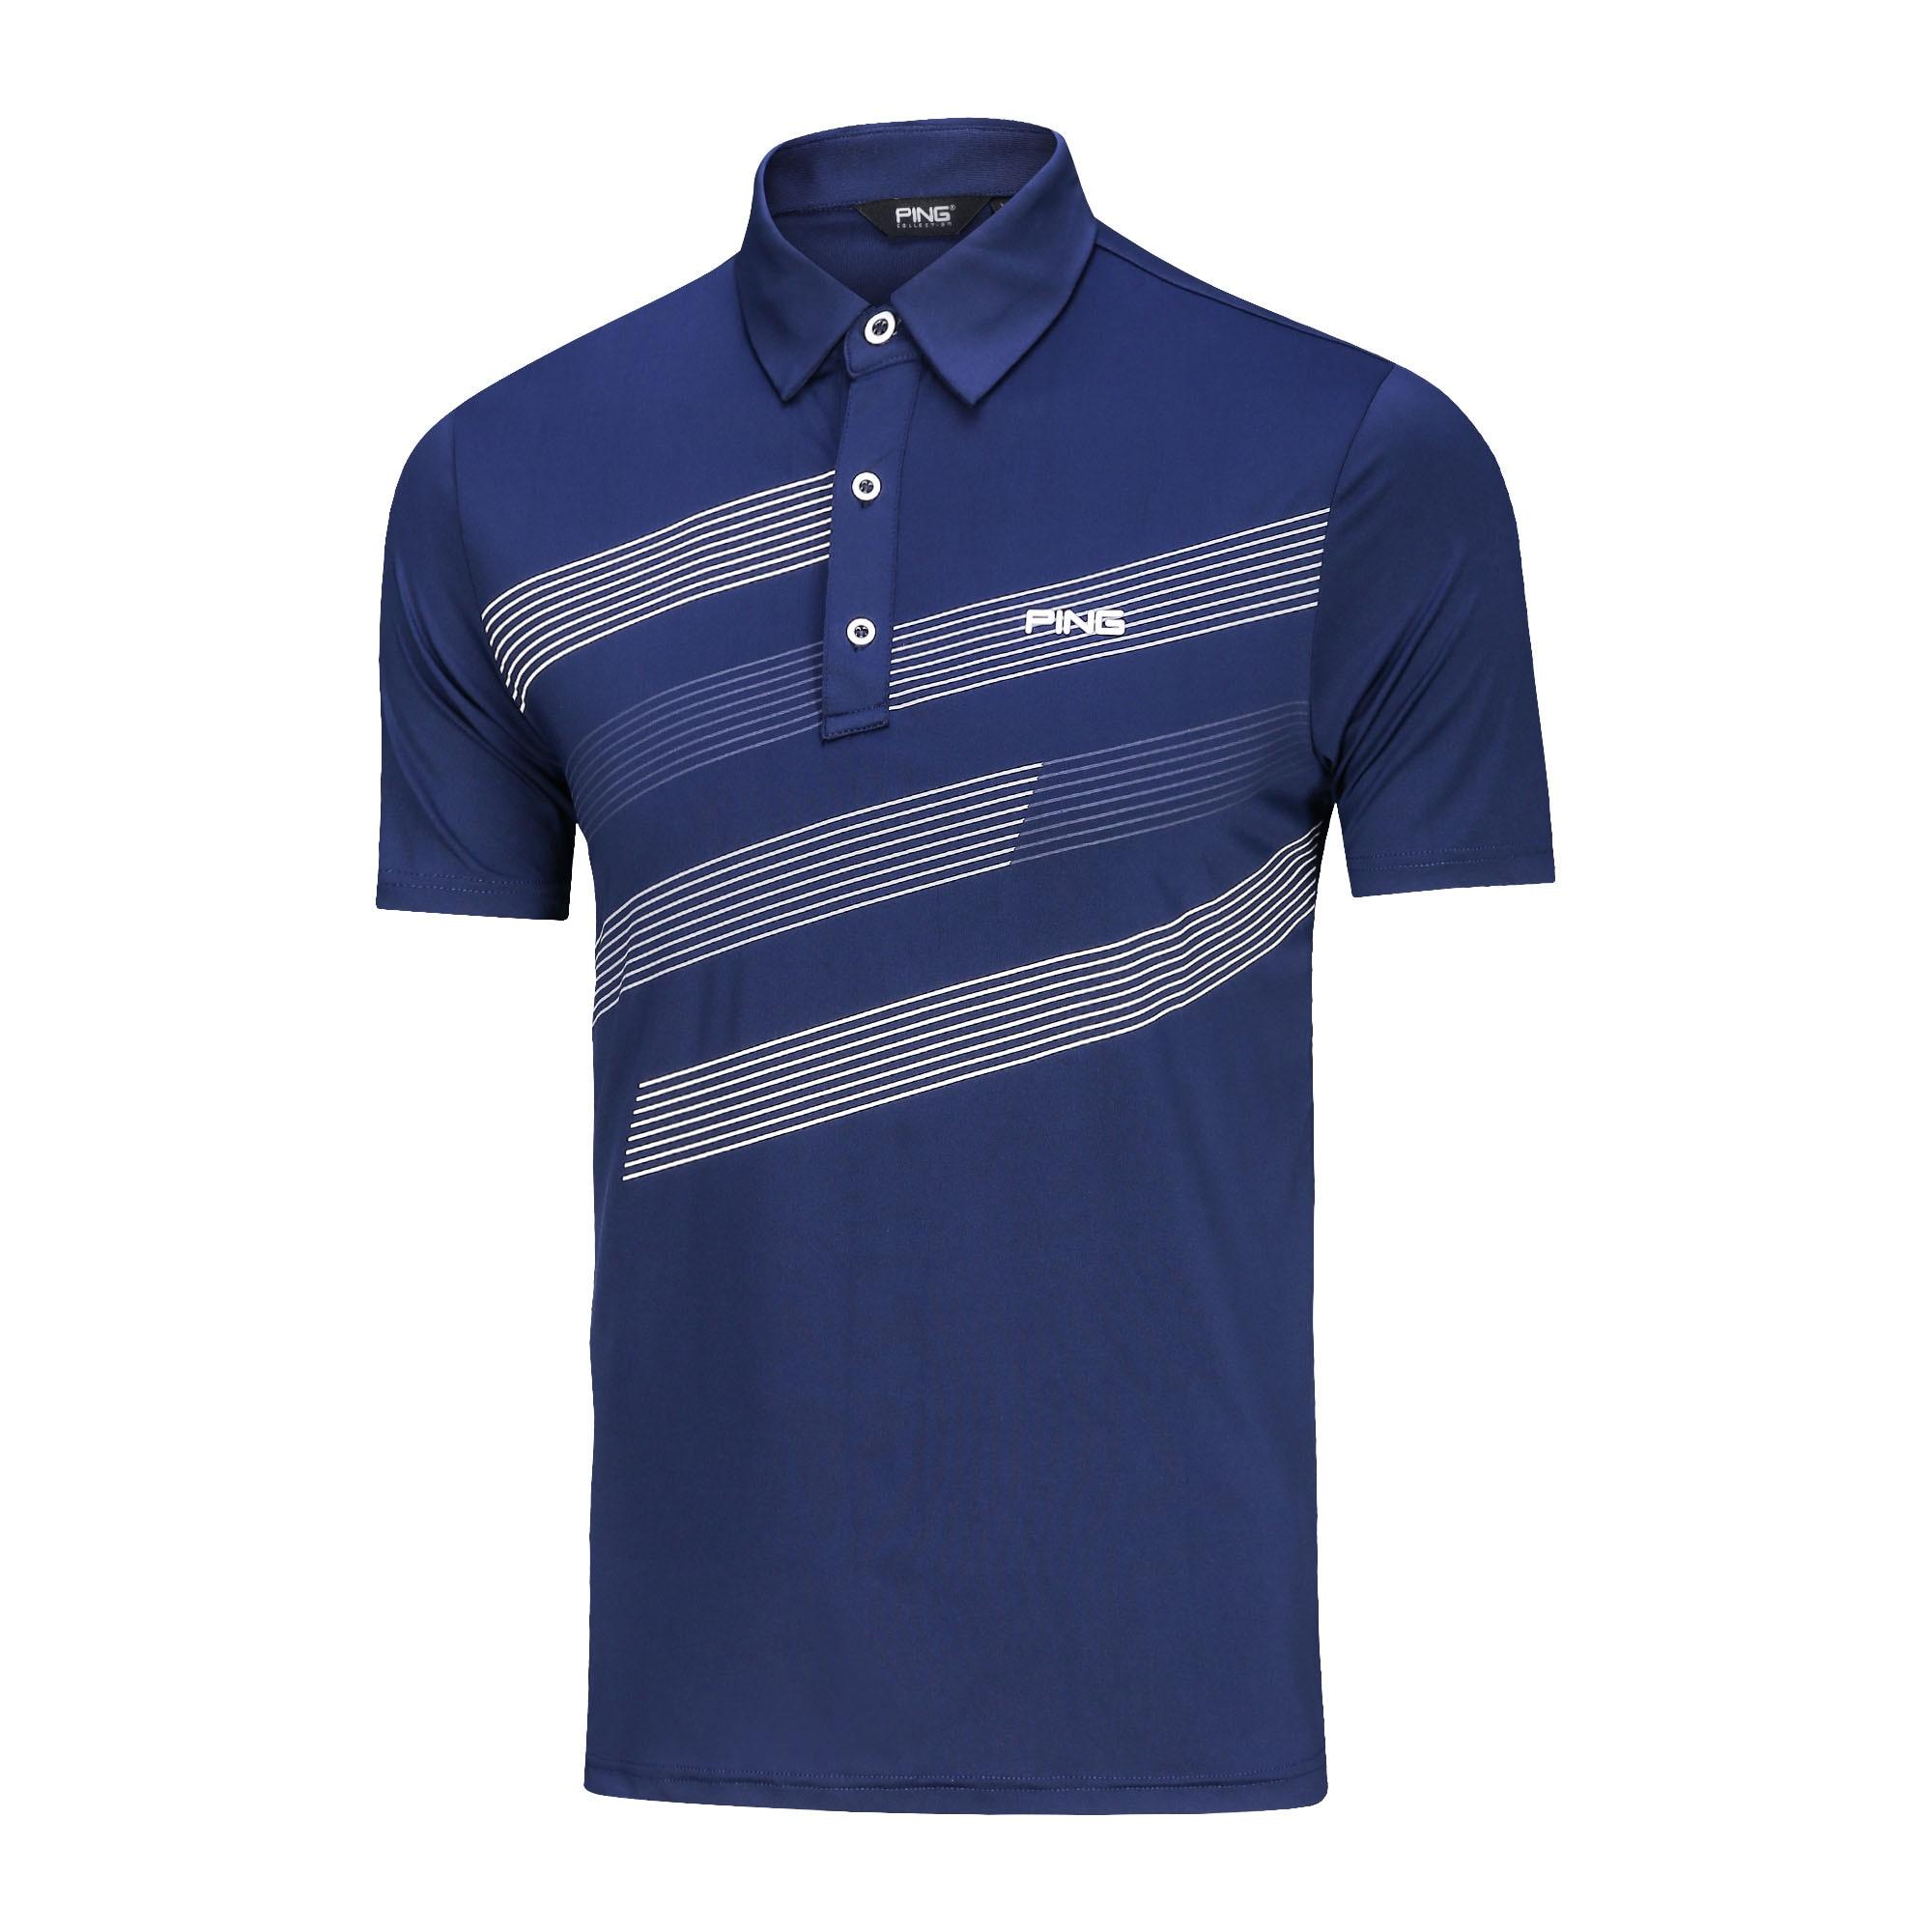 2020new Spring Men Golf Shirt Short Sleeve Quick Dry Turndown Collar Golf Clothing TA